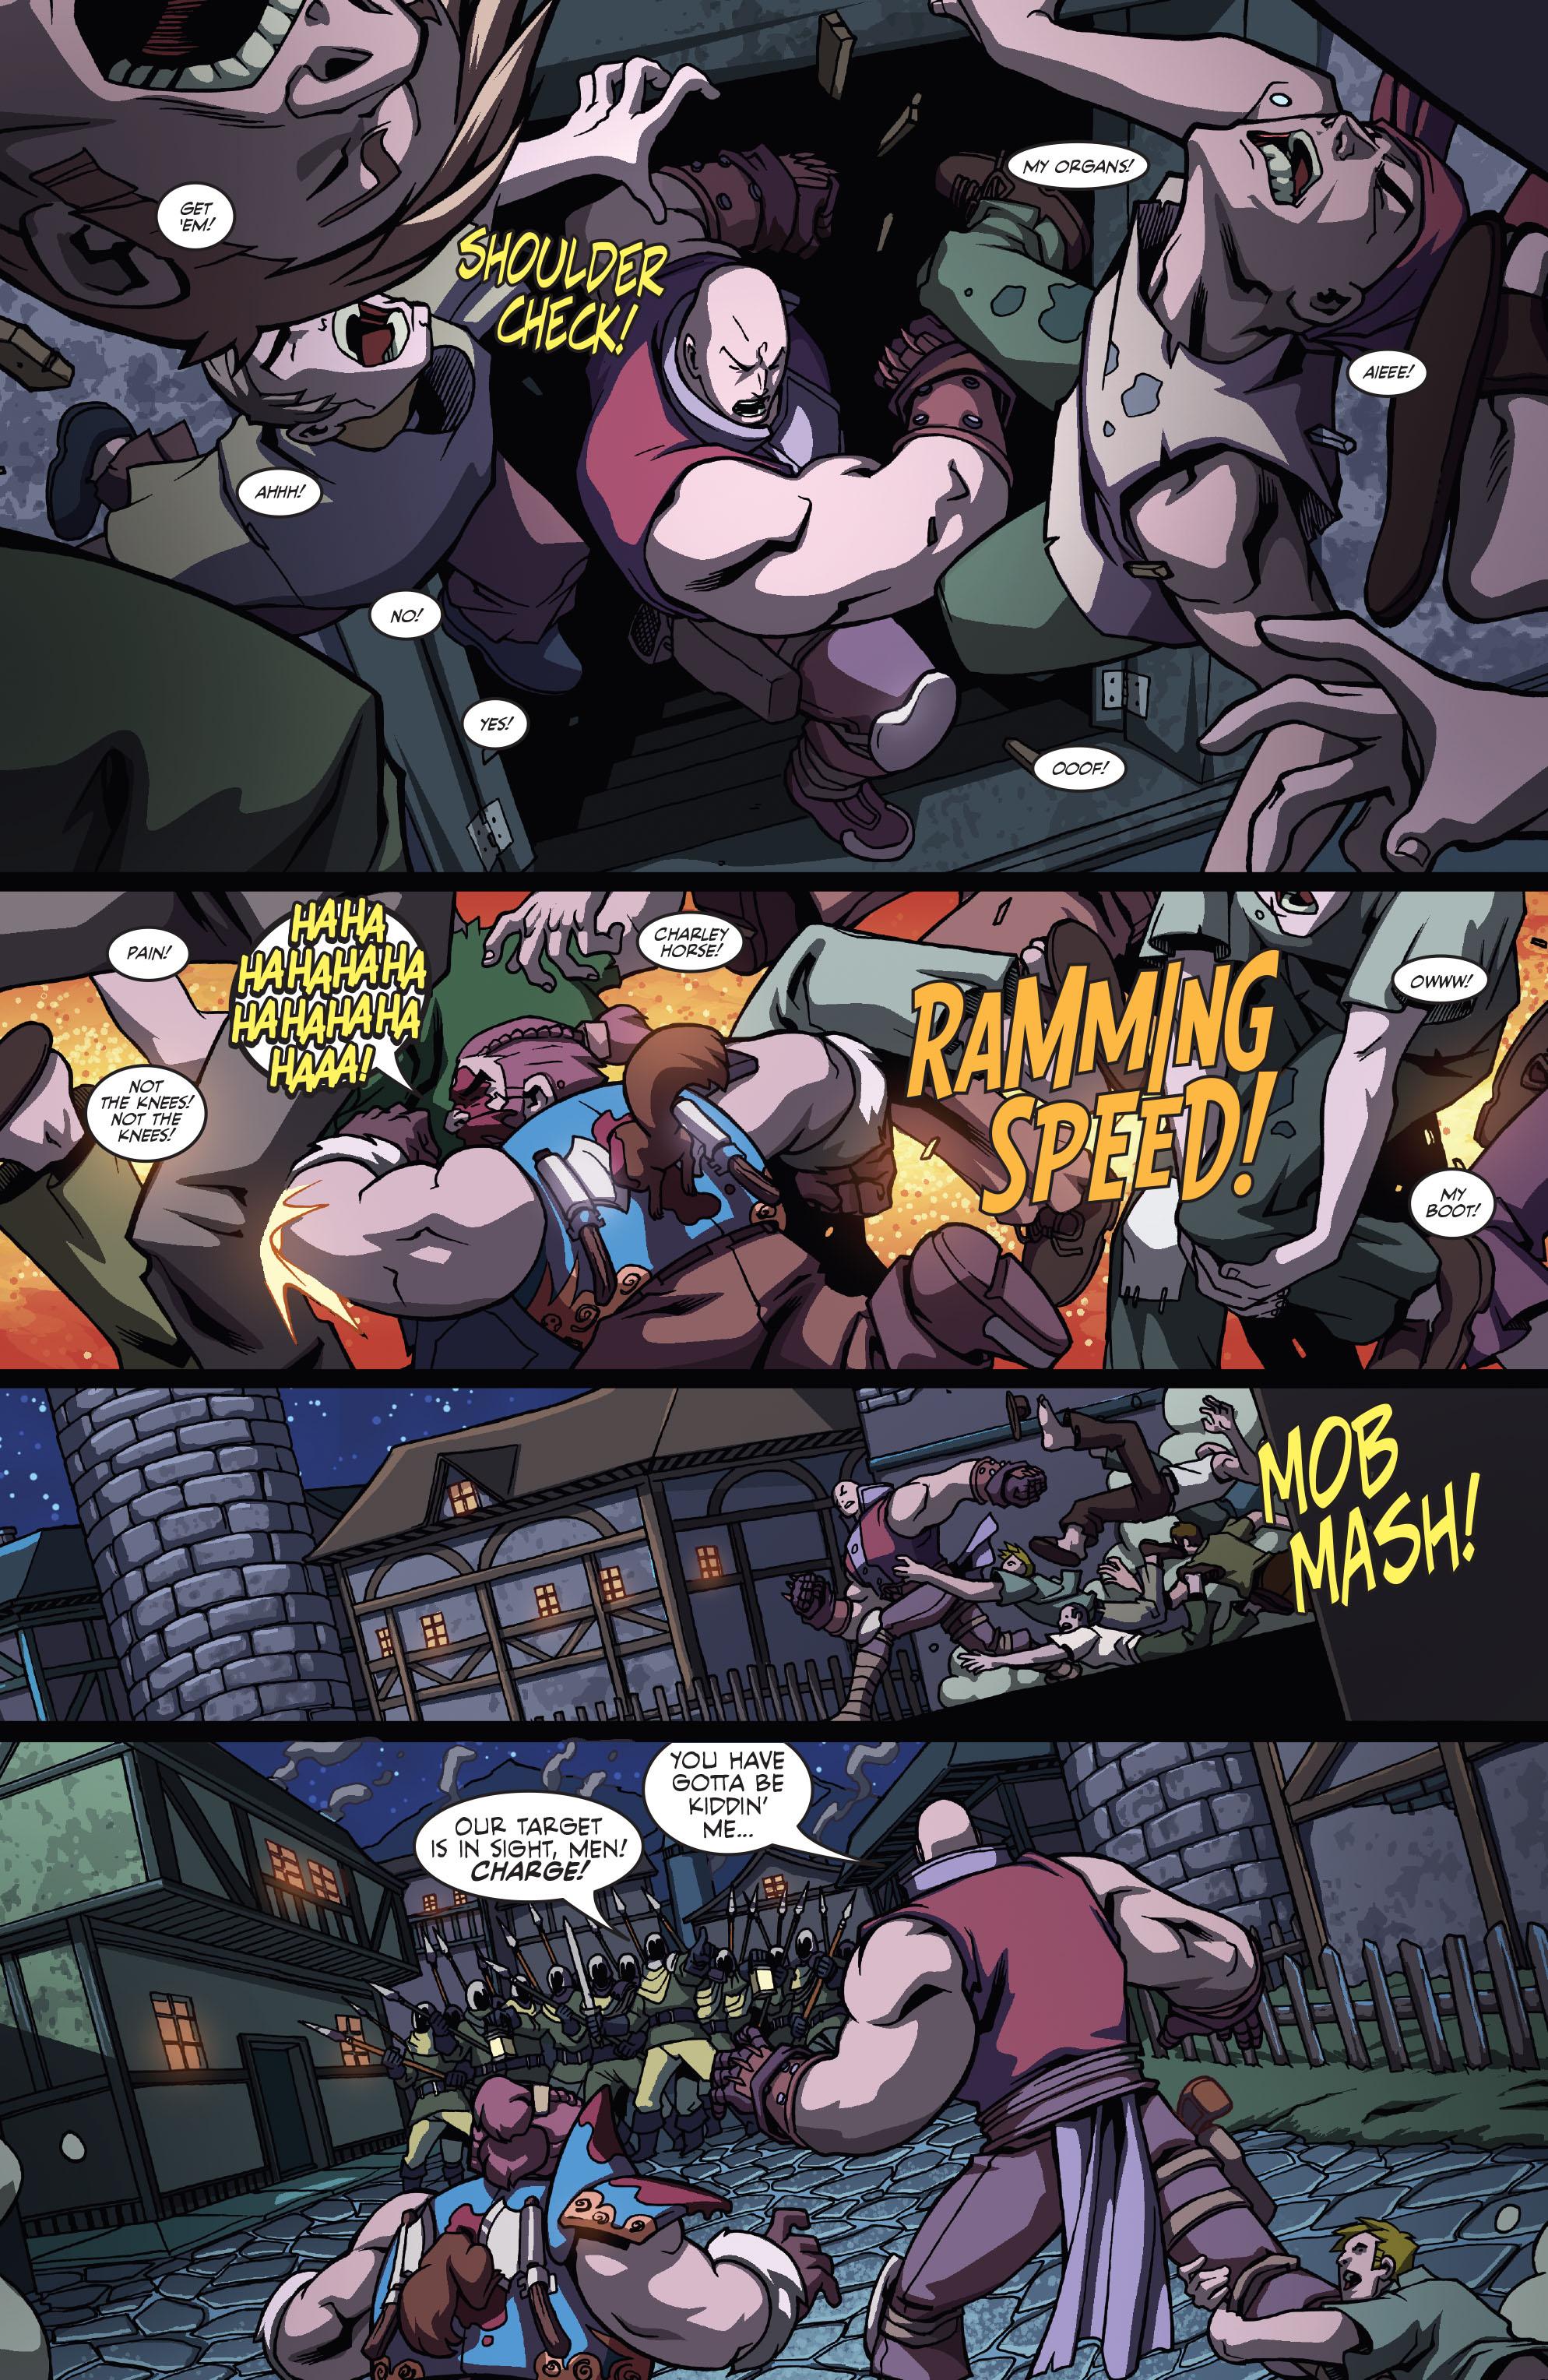 Read online Skullkickers comic -  Issue #10 - 16